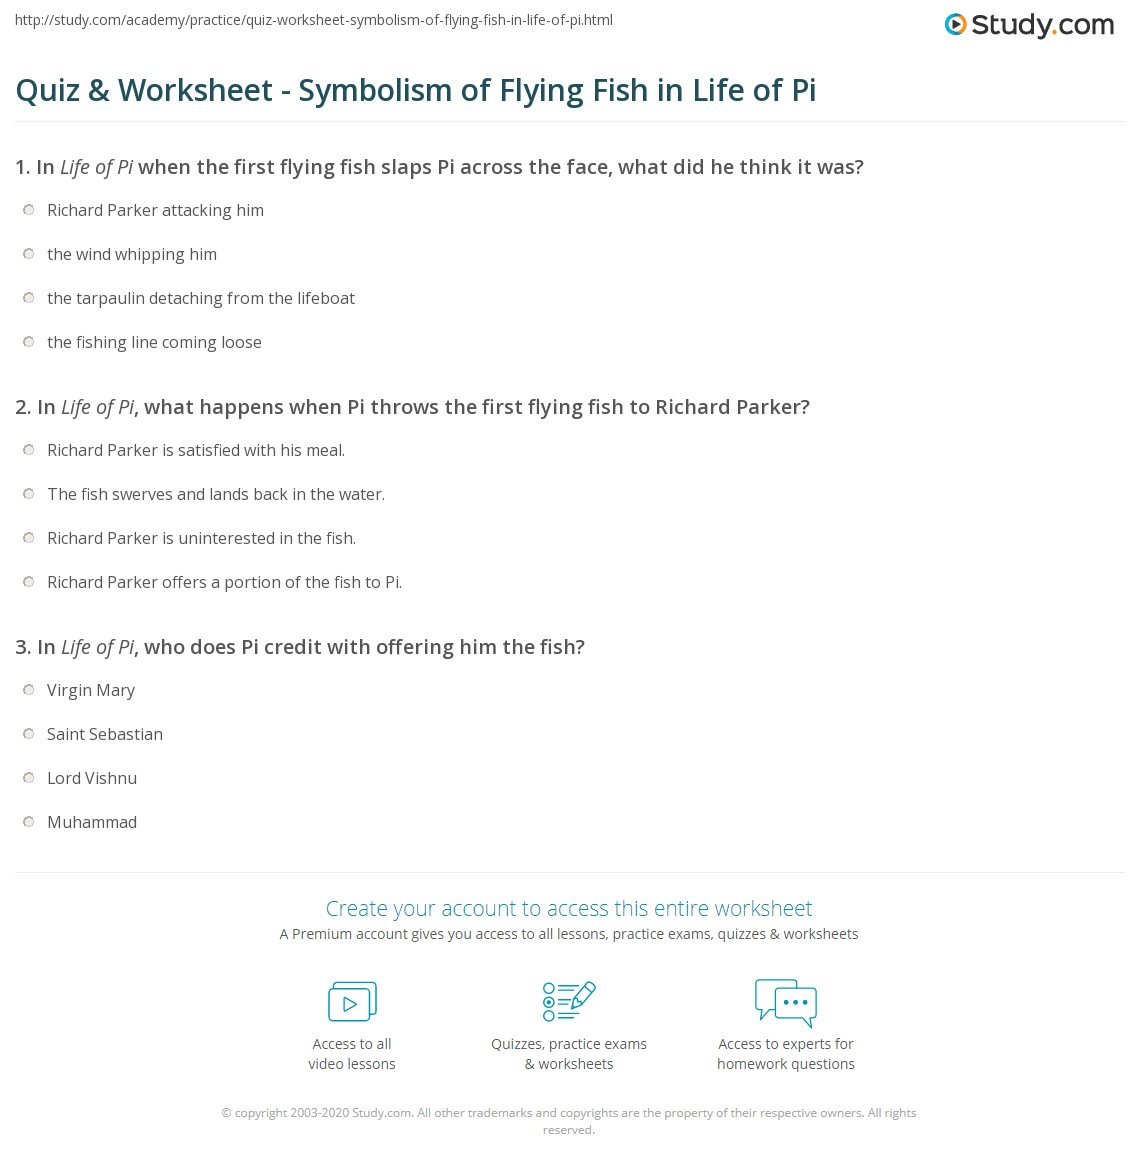 Quiz Worksheet Symbolism Of Flying Fish In Life Of Pi Study